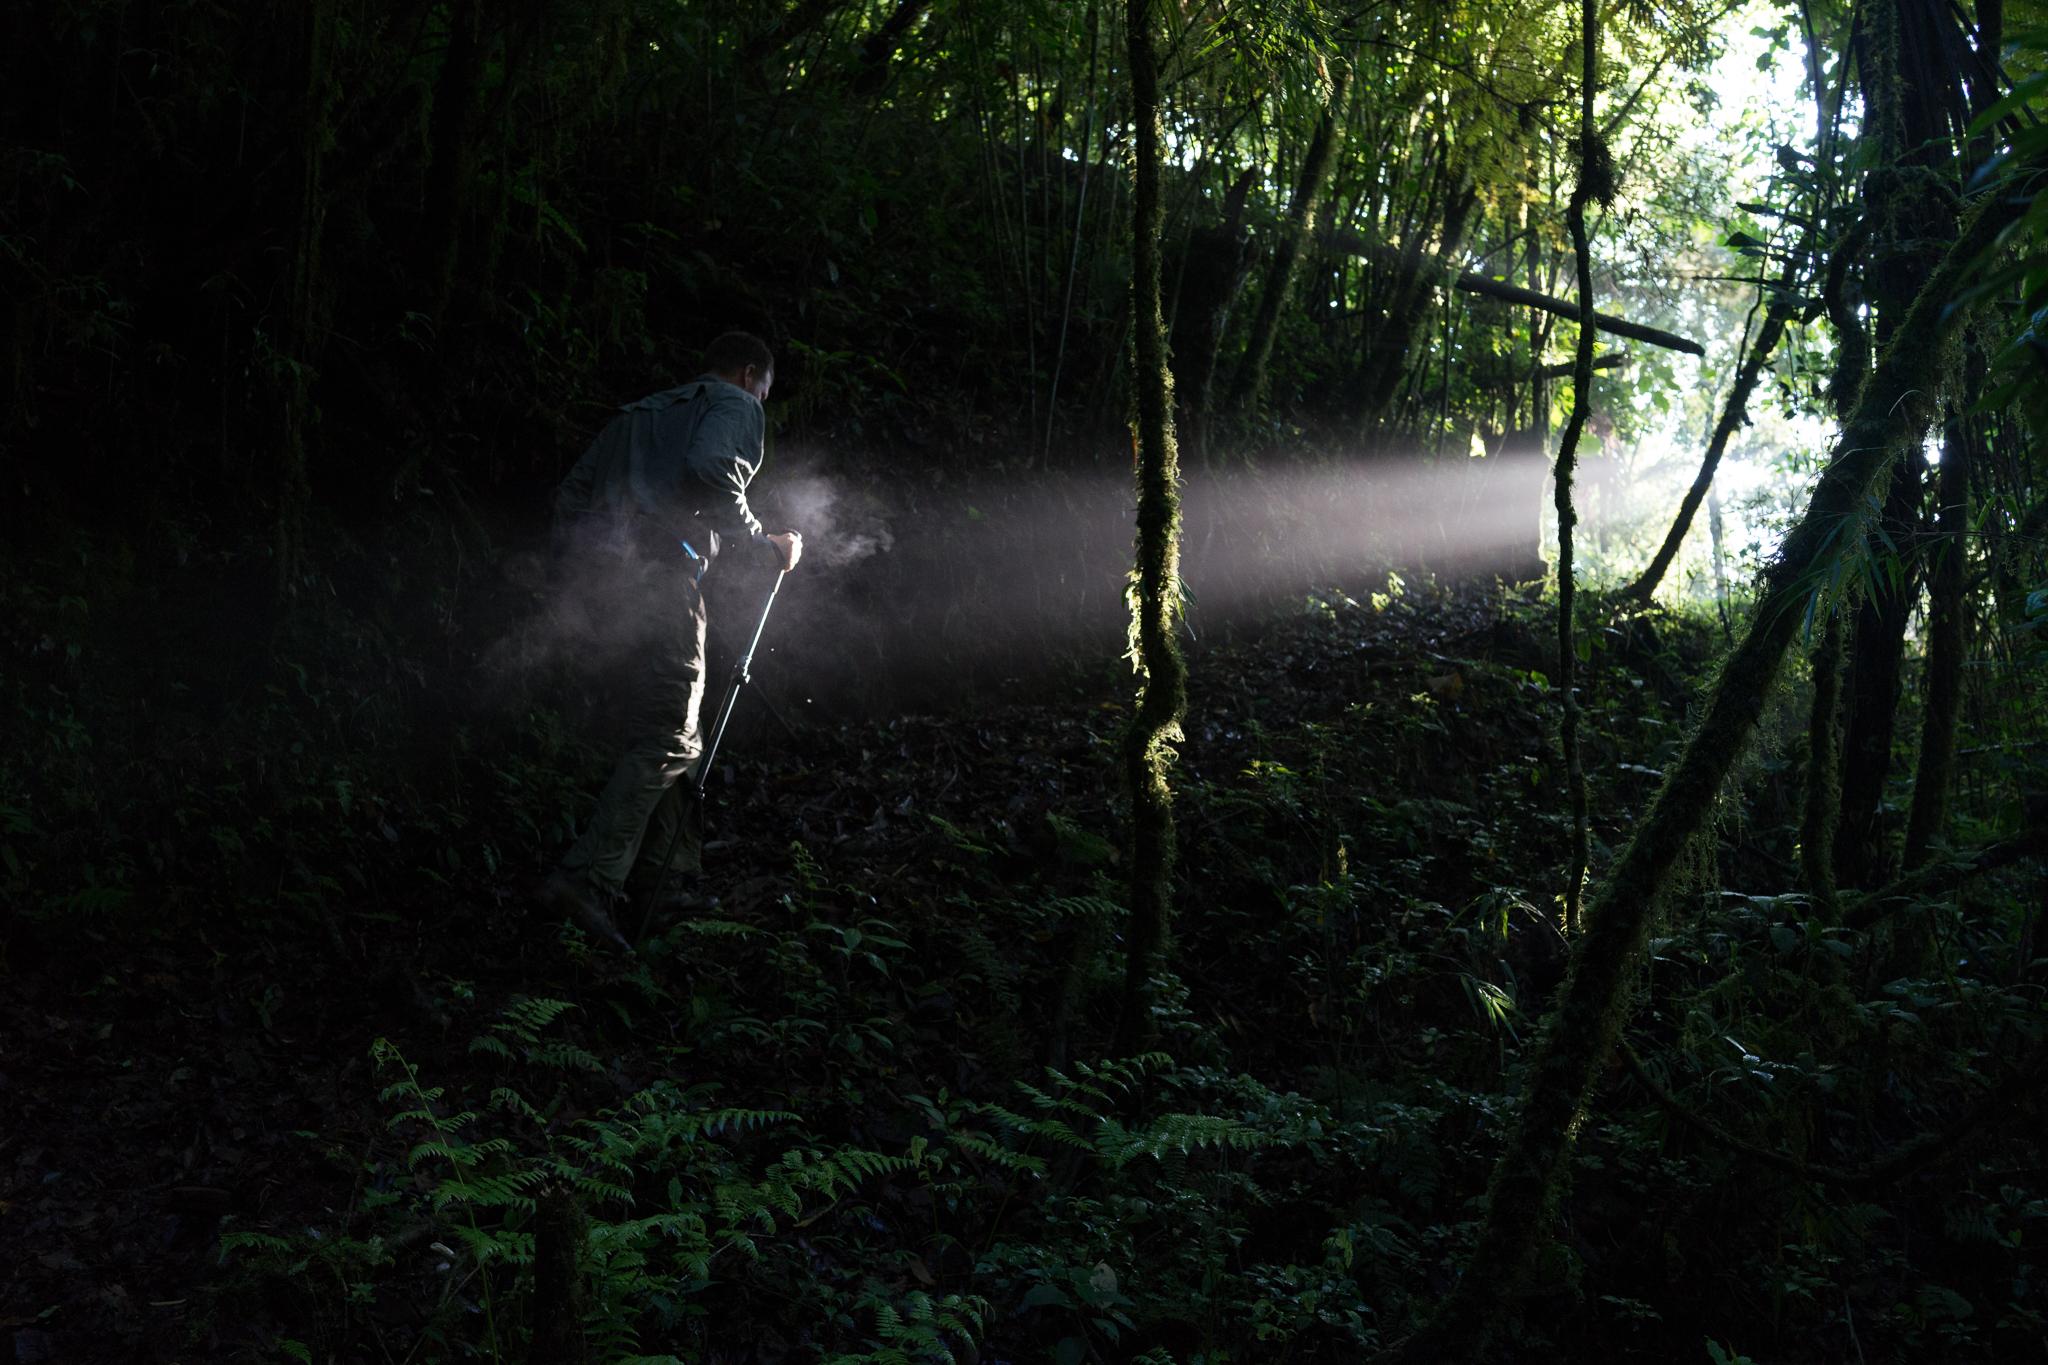 Writer Erik Vance treks into the cloud forest near El Zapotal, Veracruz.